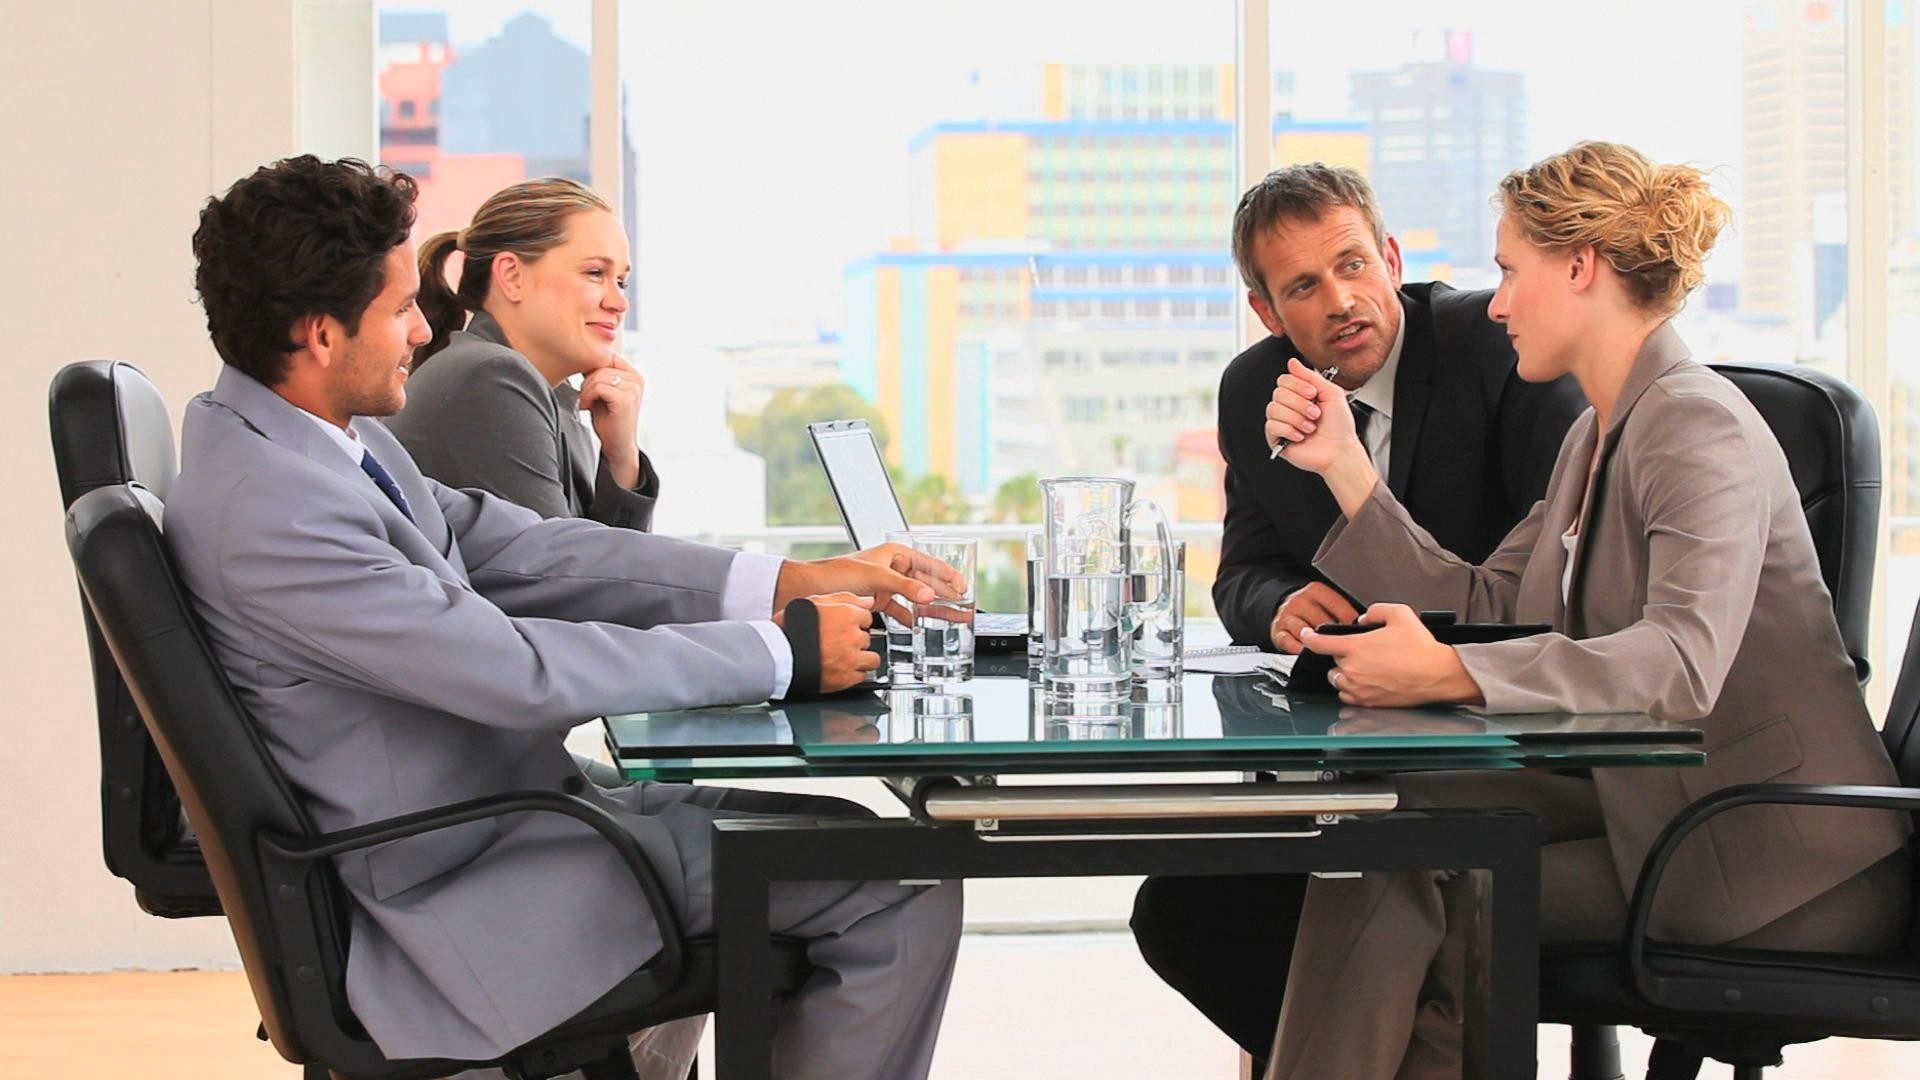 cropped meeting between business people - Подготовка и отправка нулевой отчетности